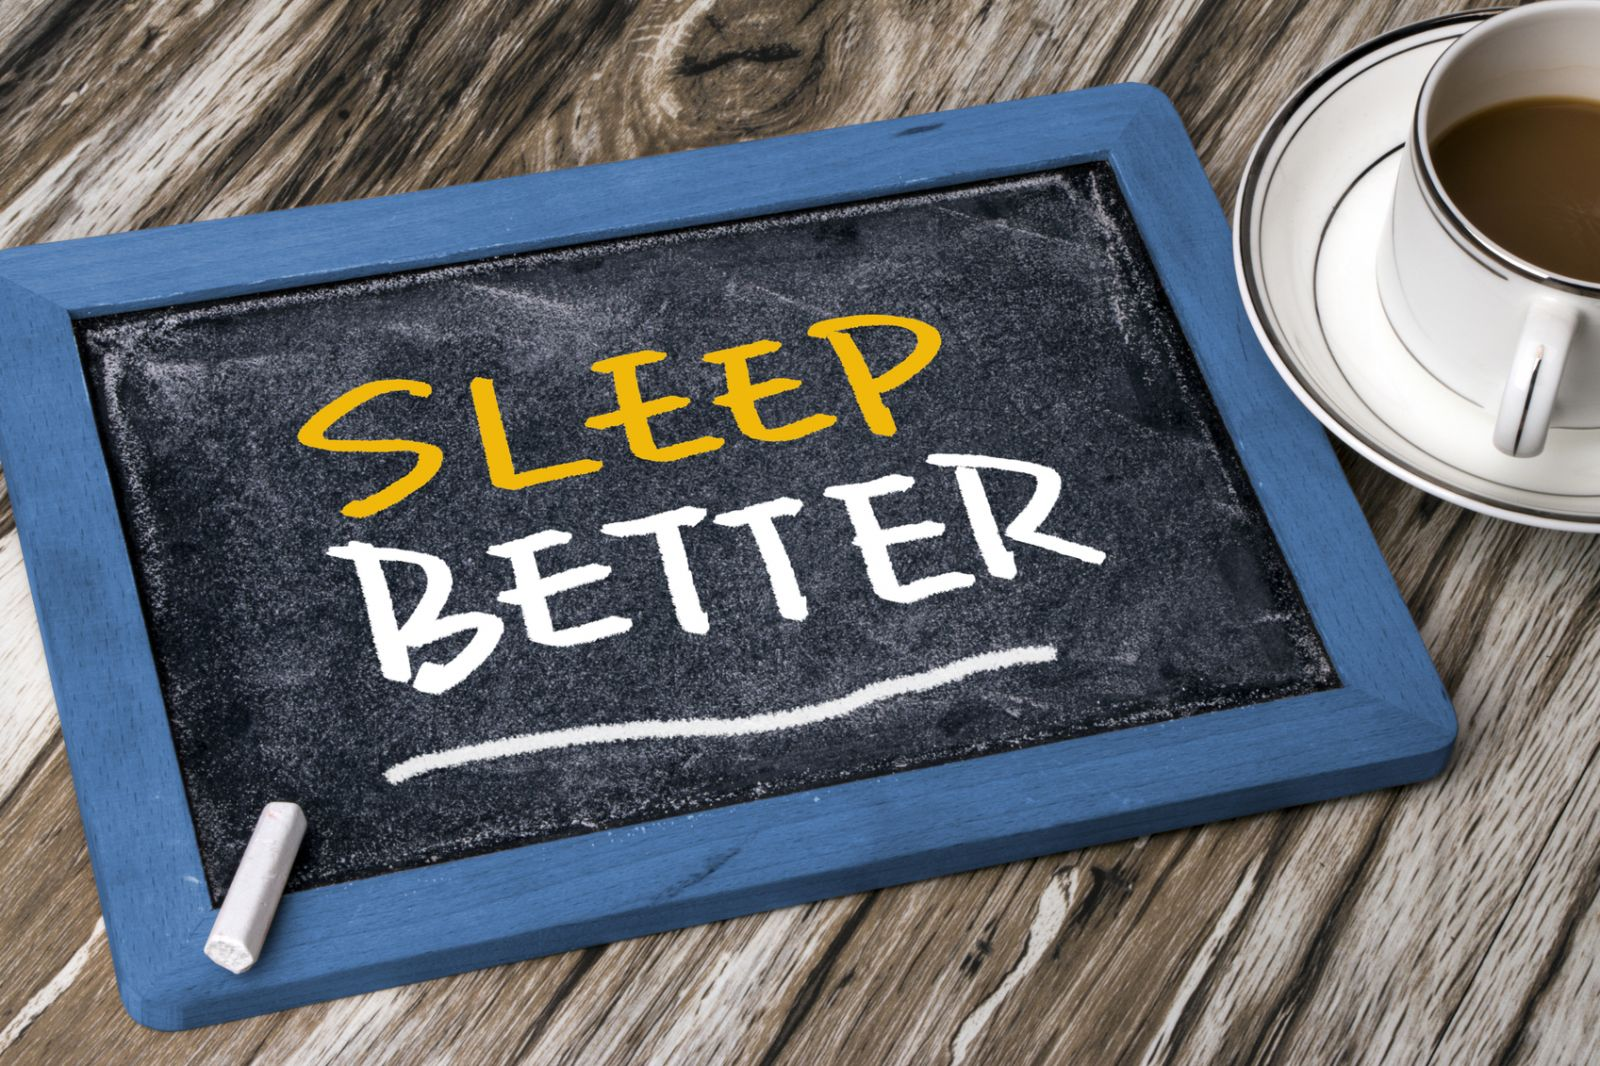 Sleep Better written on a small chalkboard